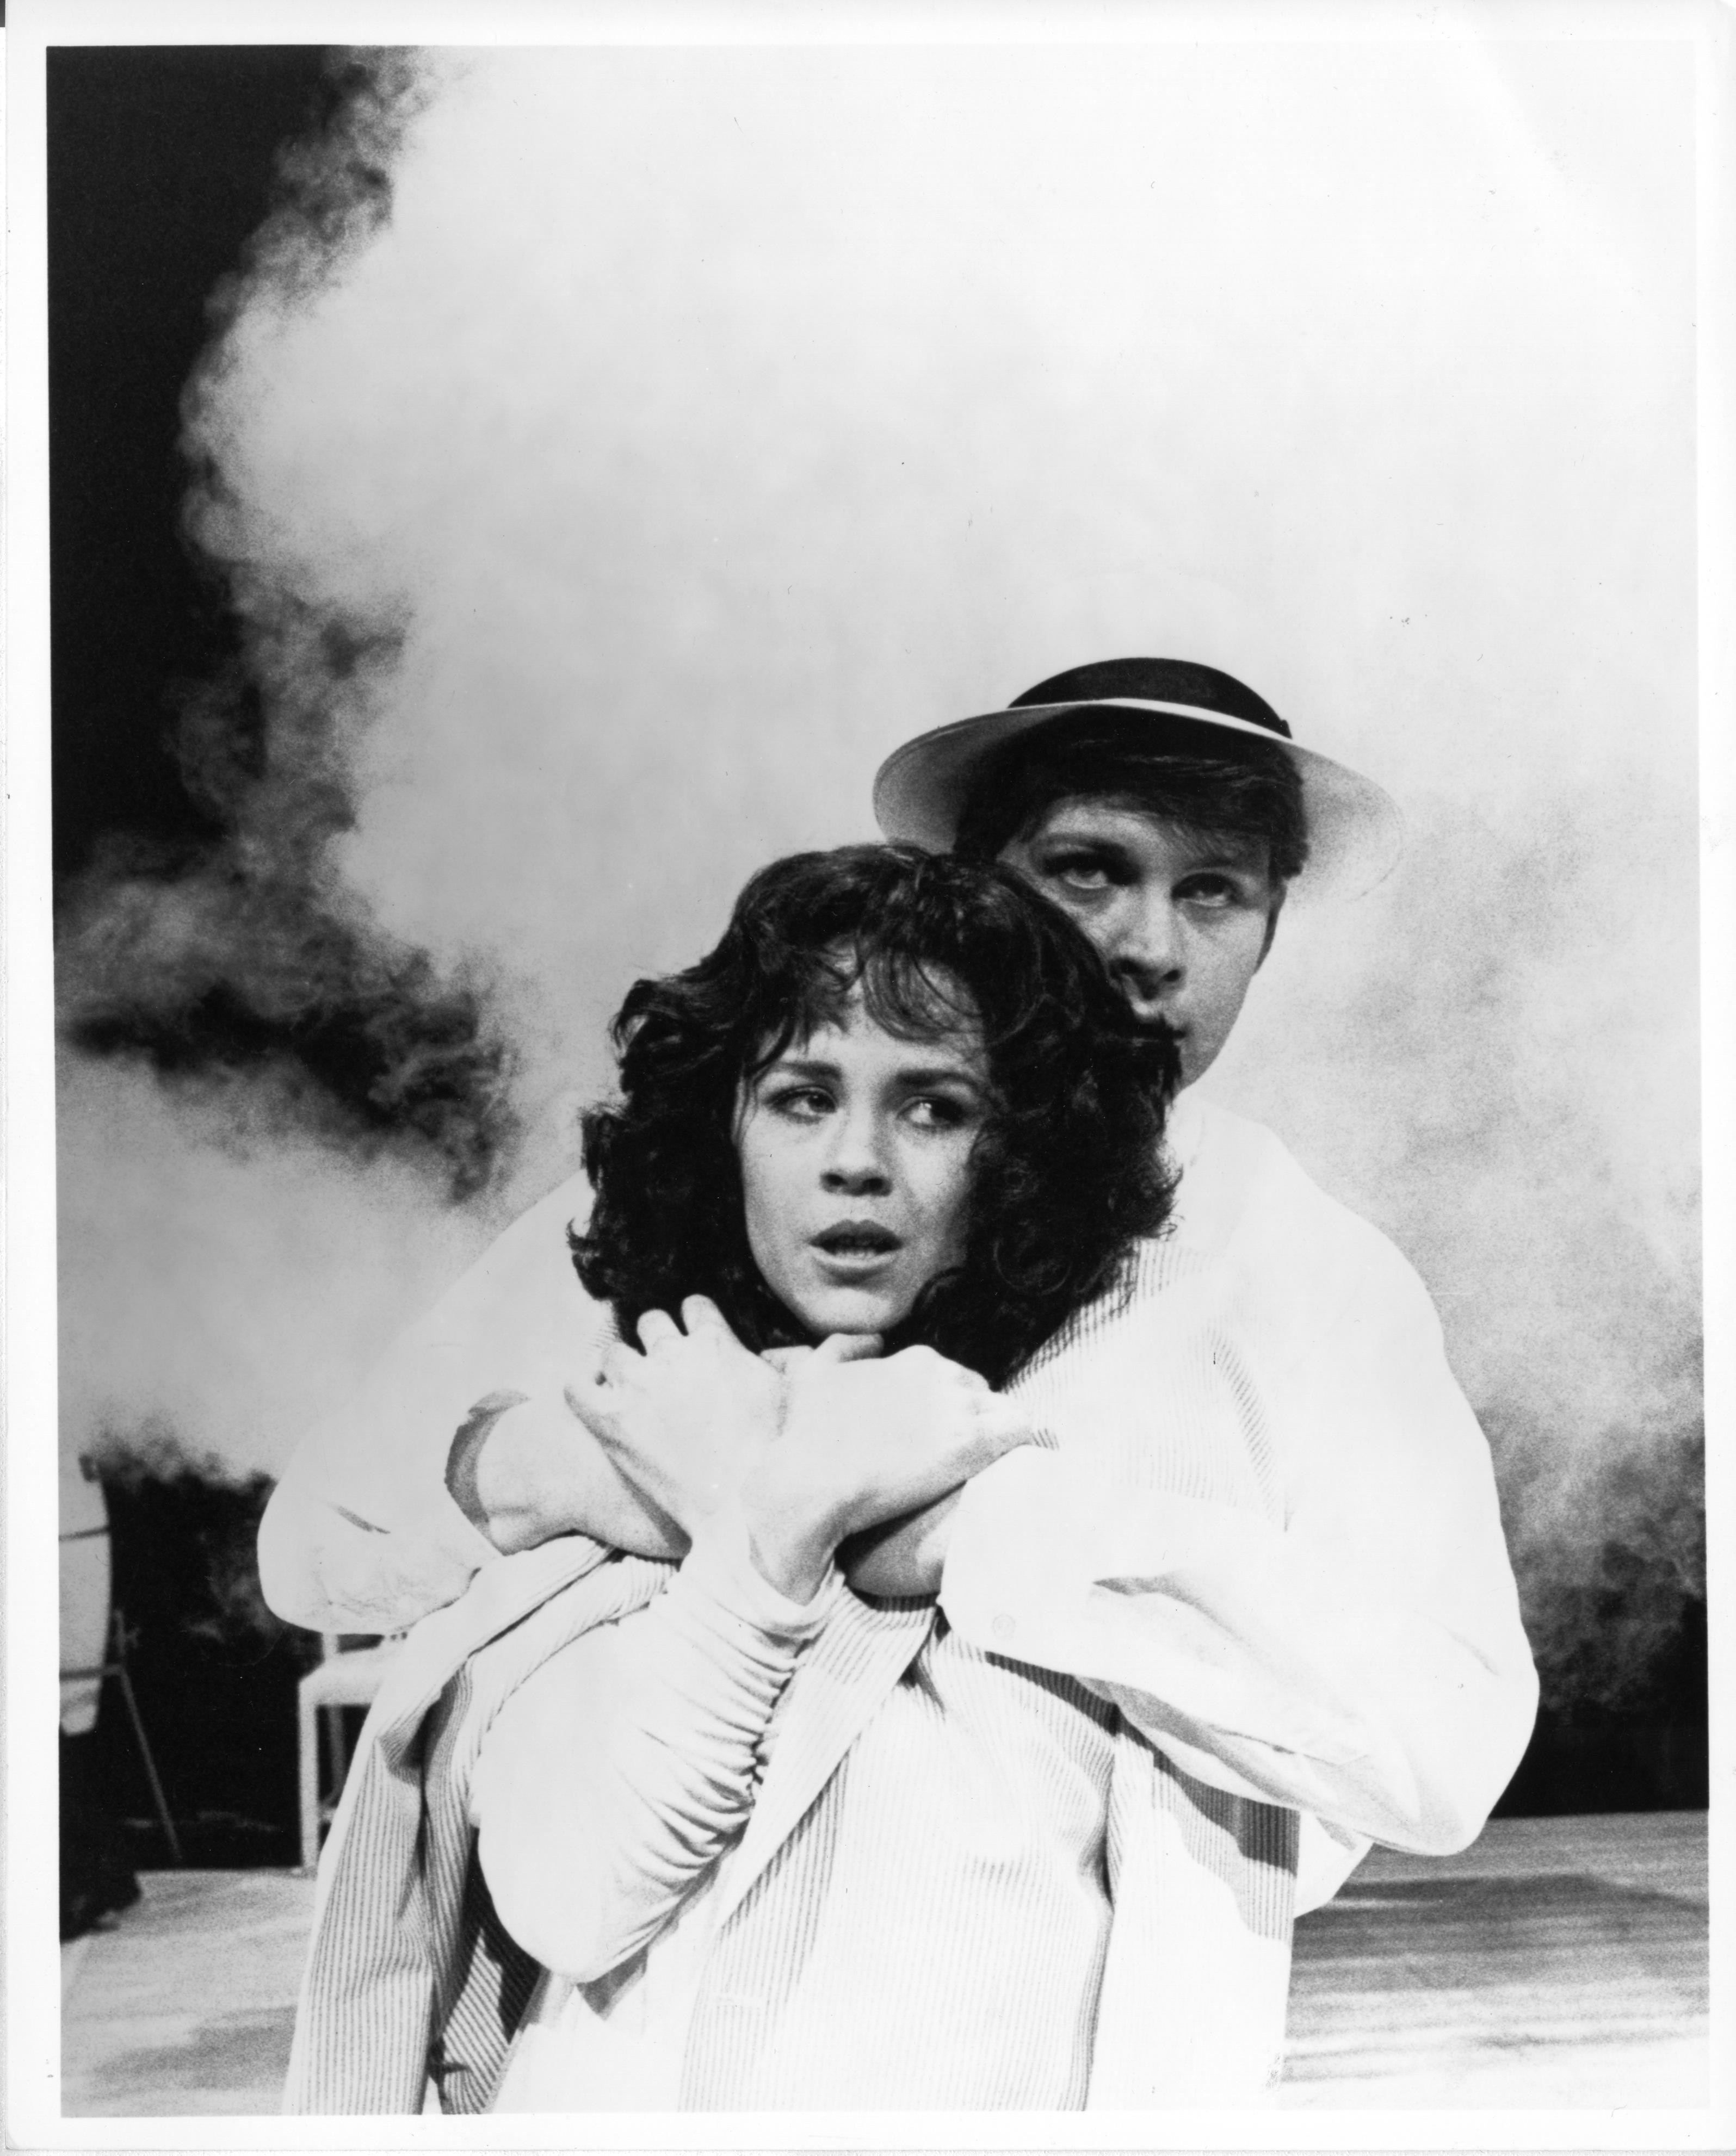 Twelfth Night (1986-1987)